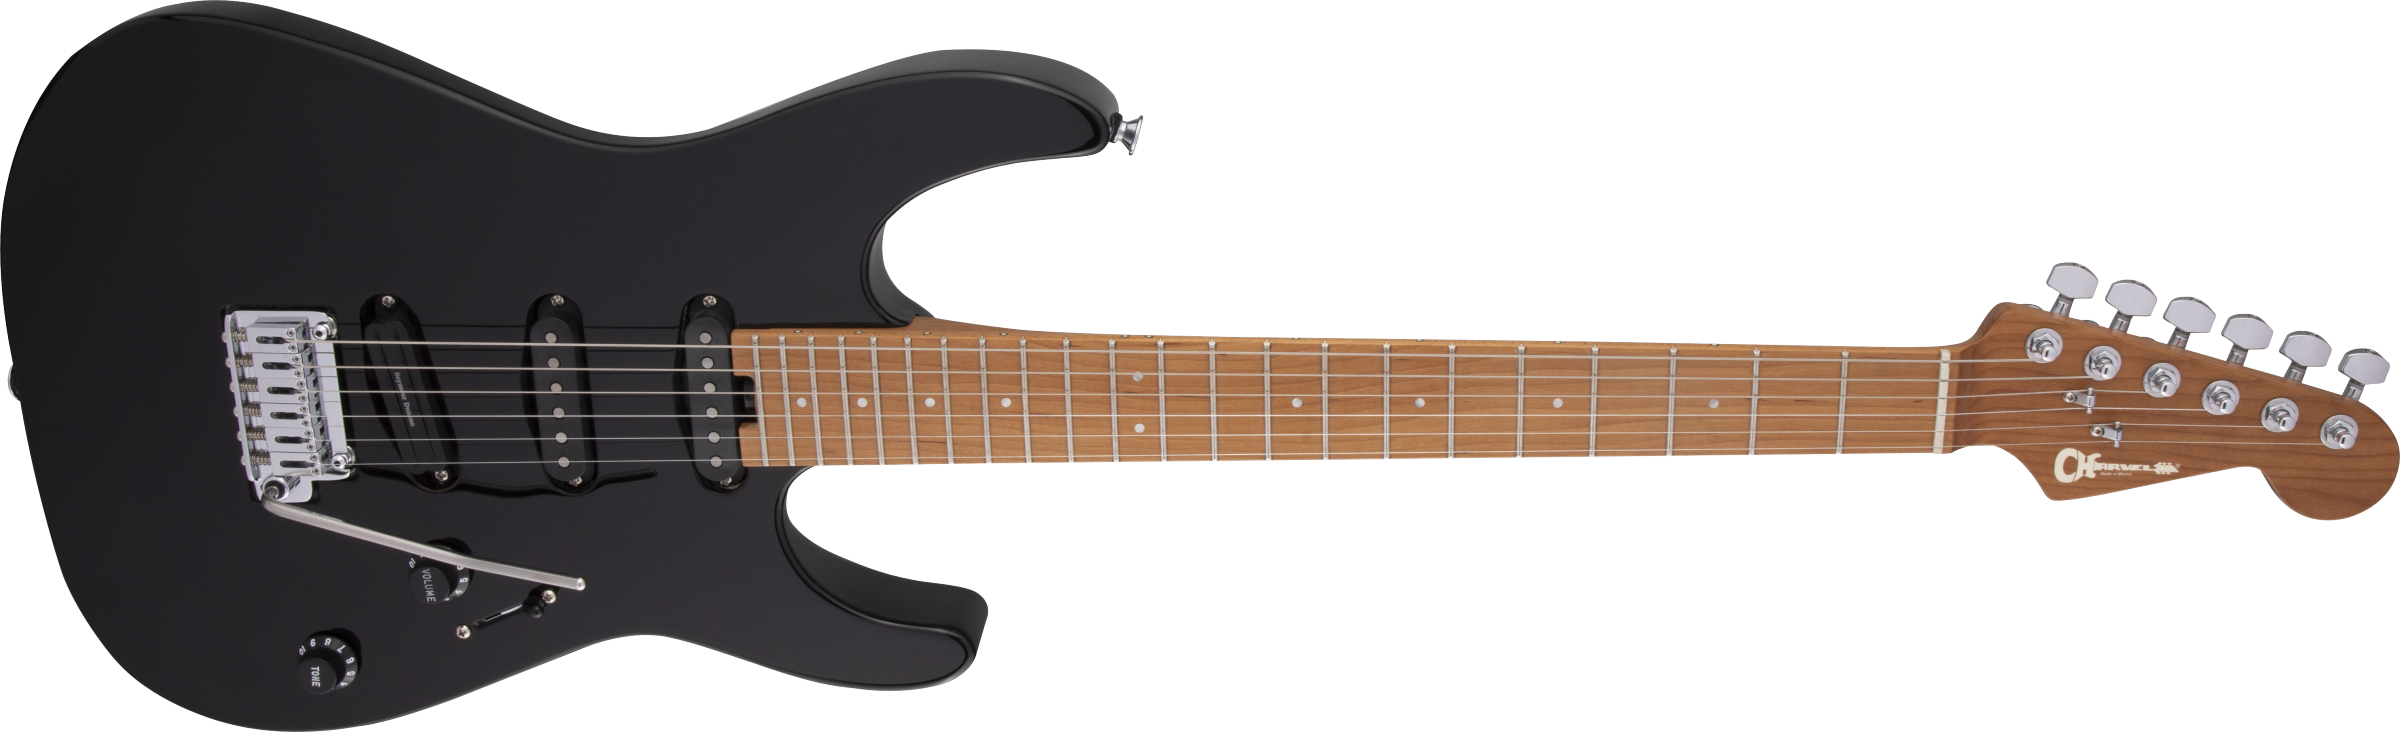 Charvel Pro-Mod DK22 SSS 2PT CM, Caramelized Maple Fingerboard, Gloss Black